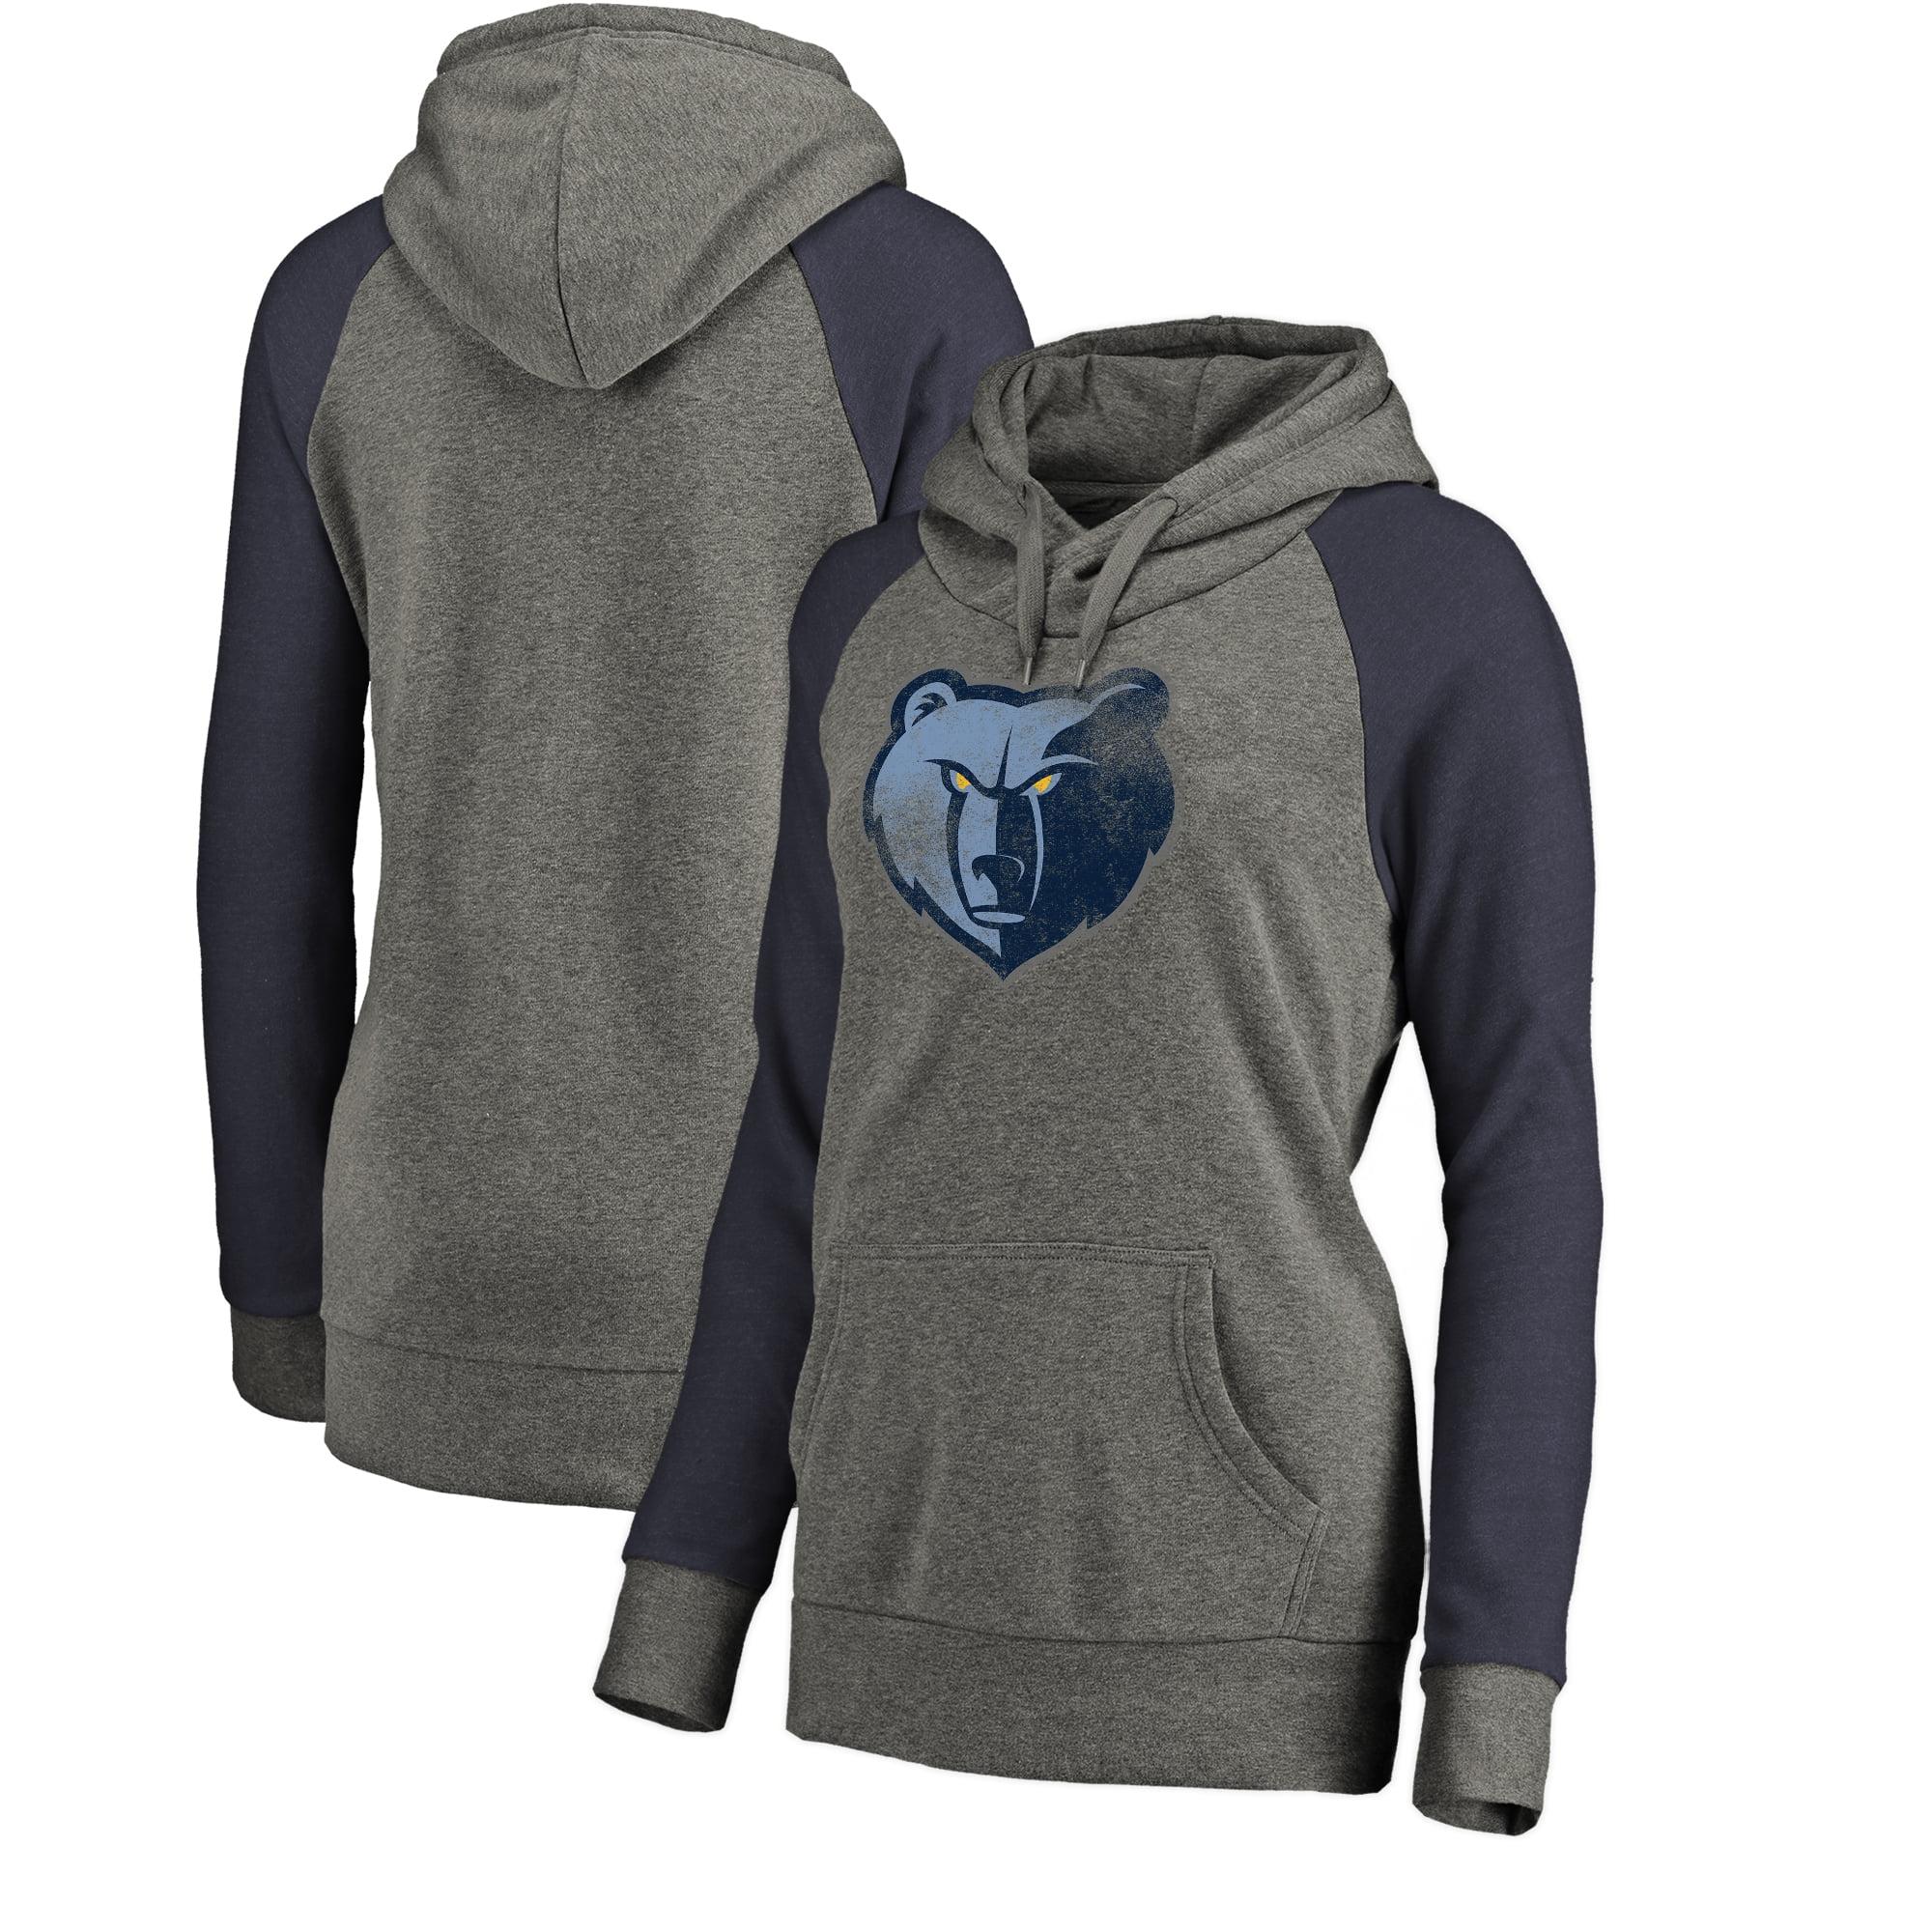 Memphis Grizzlies Fanatics Branded Women's Ash/Navy Distressed Logo Tri-Blend Plus Size Pullover Hoodie